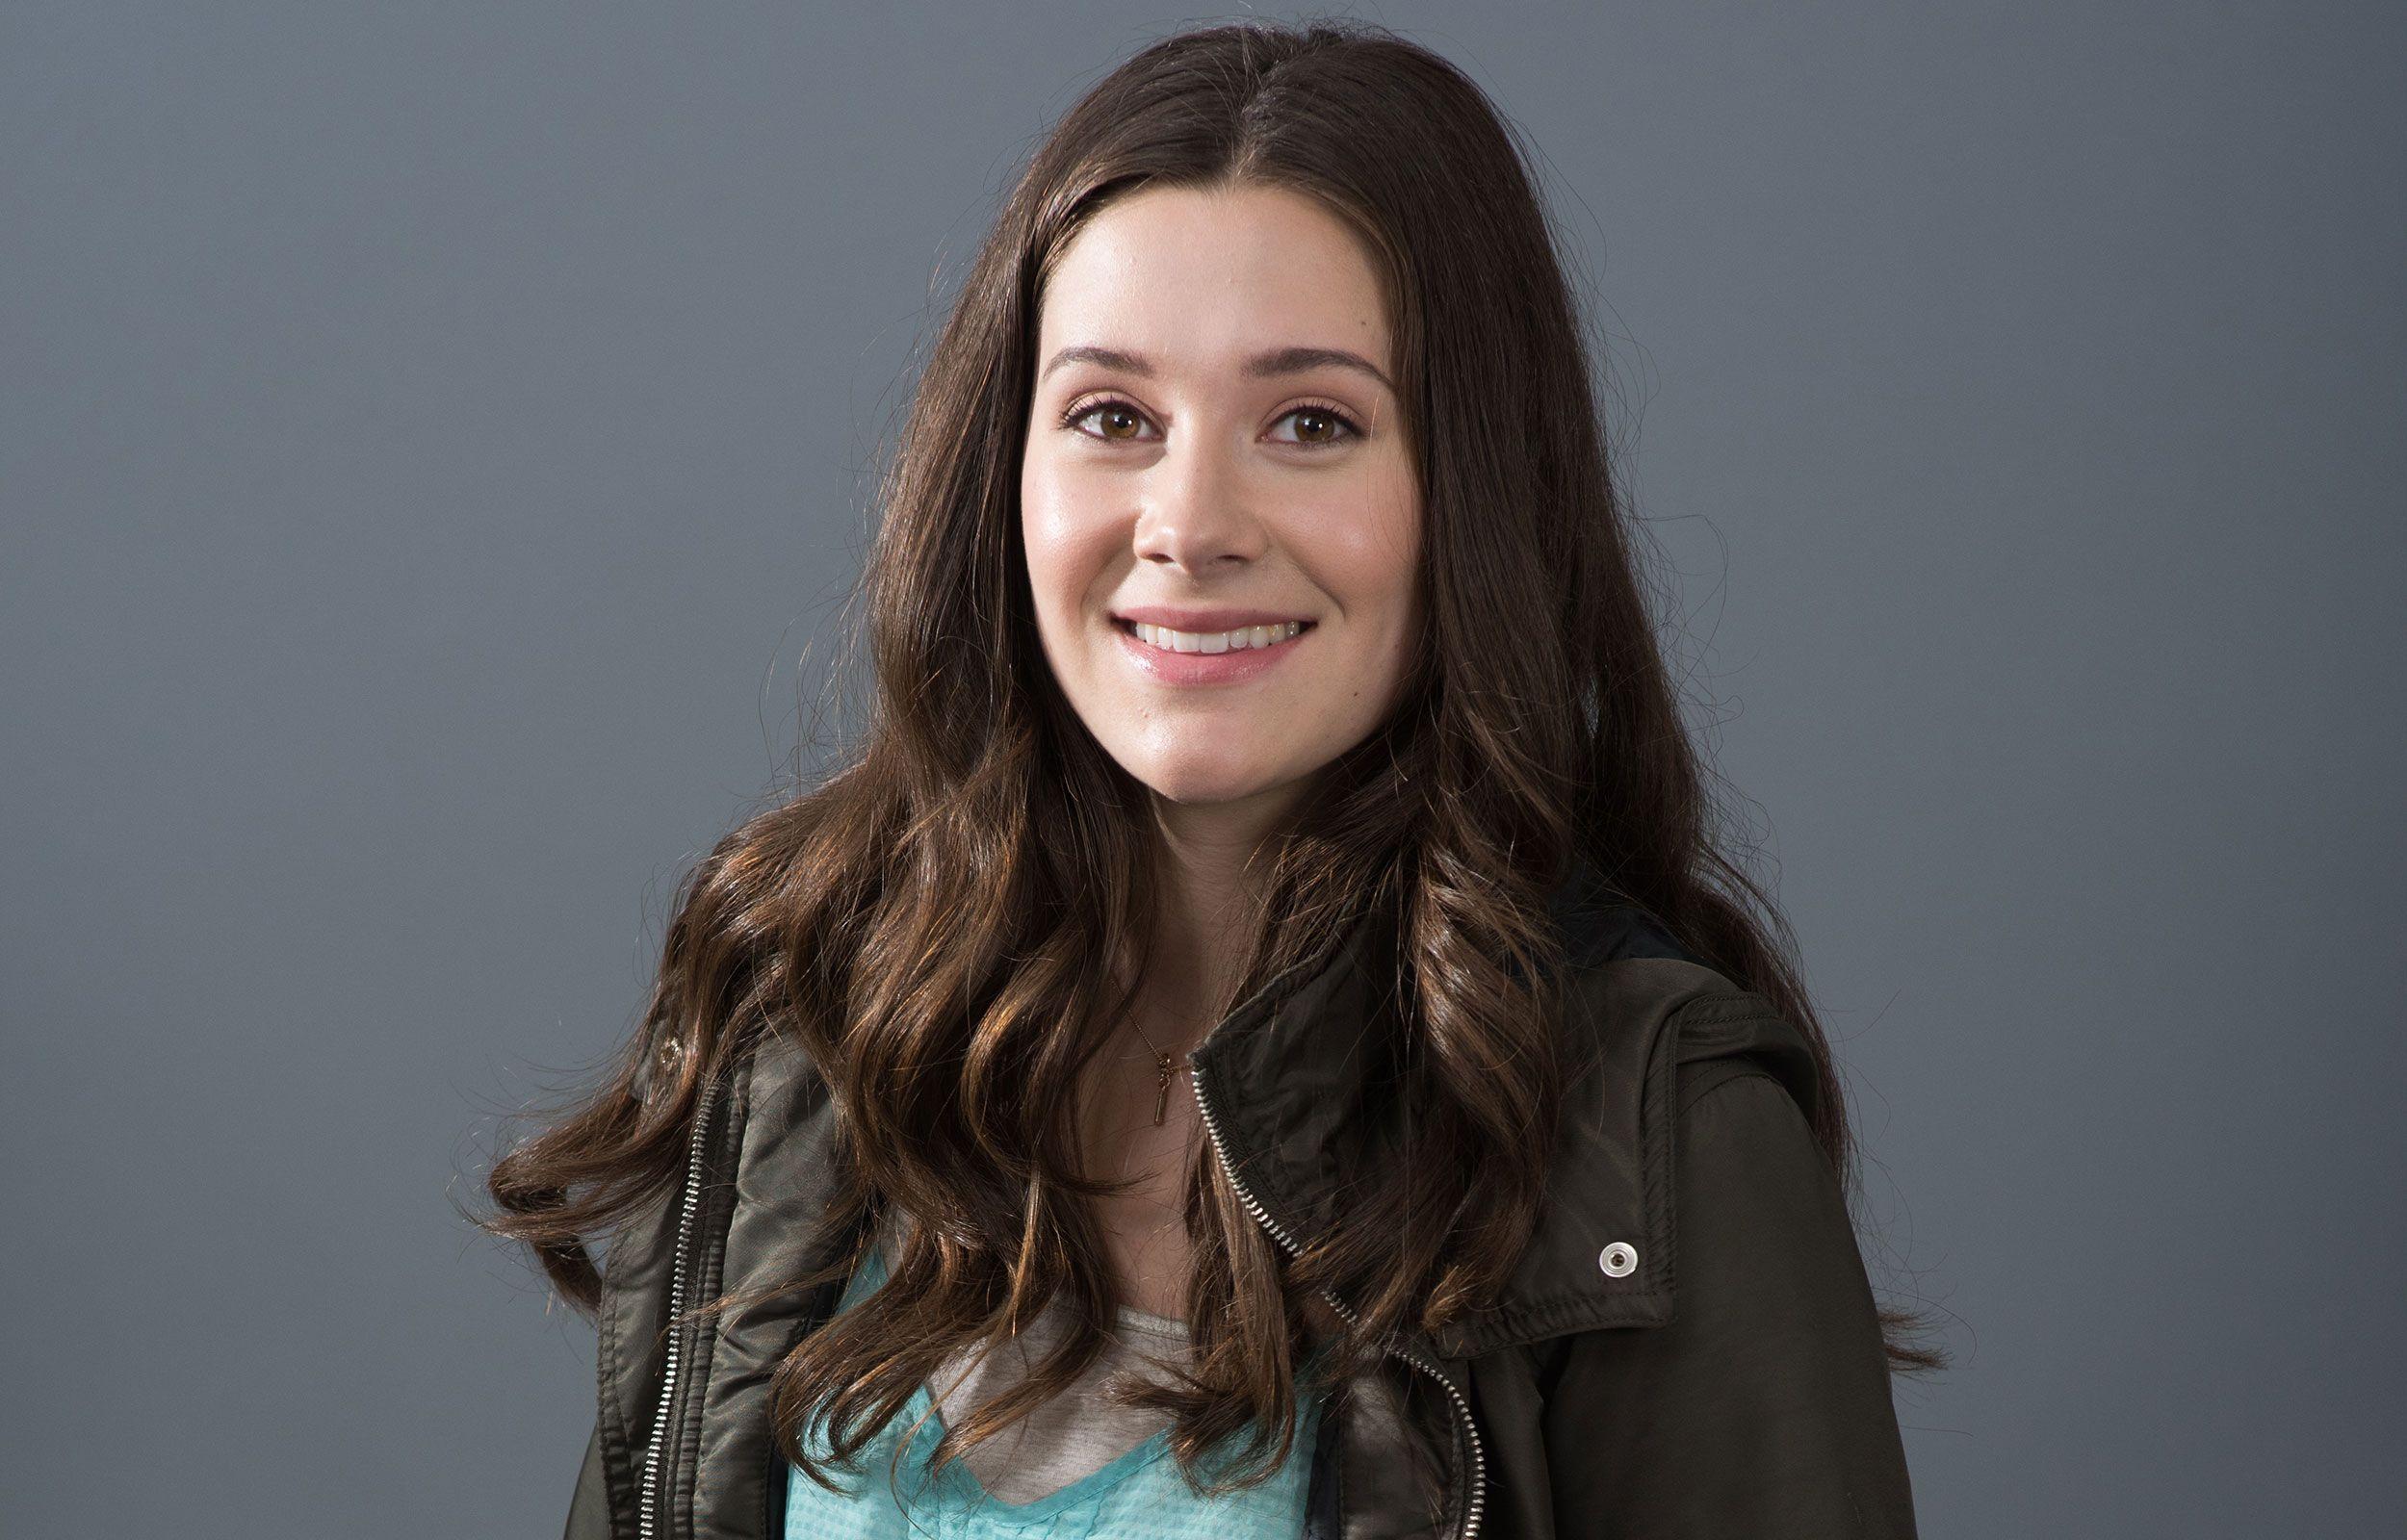 Liz Smith (actress) forecast